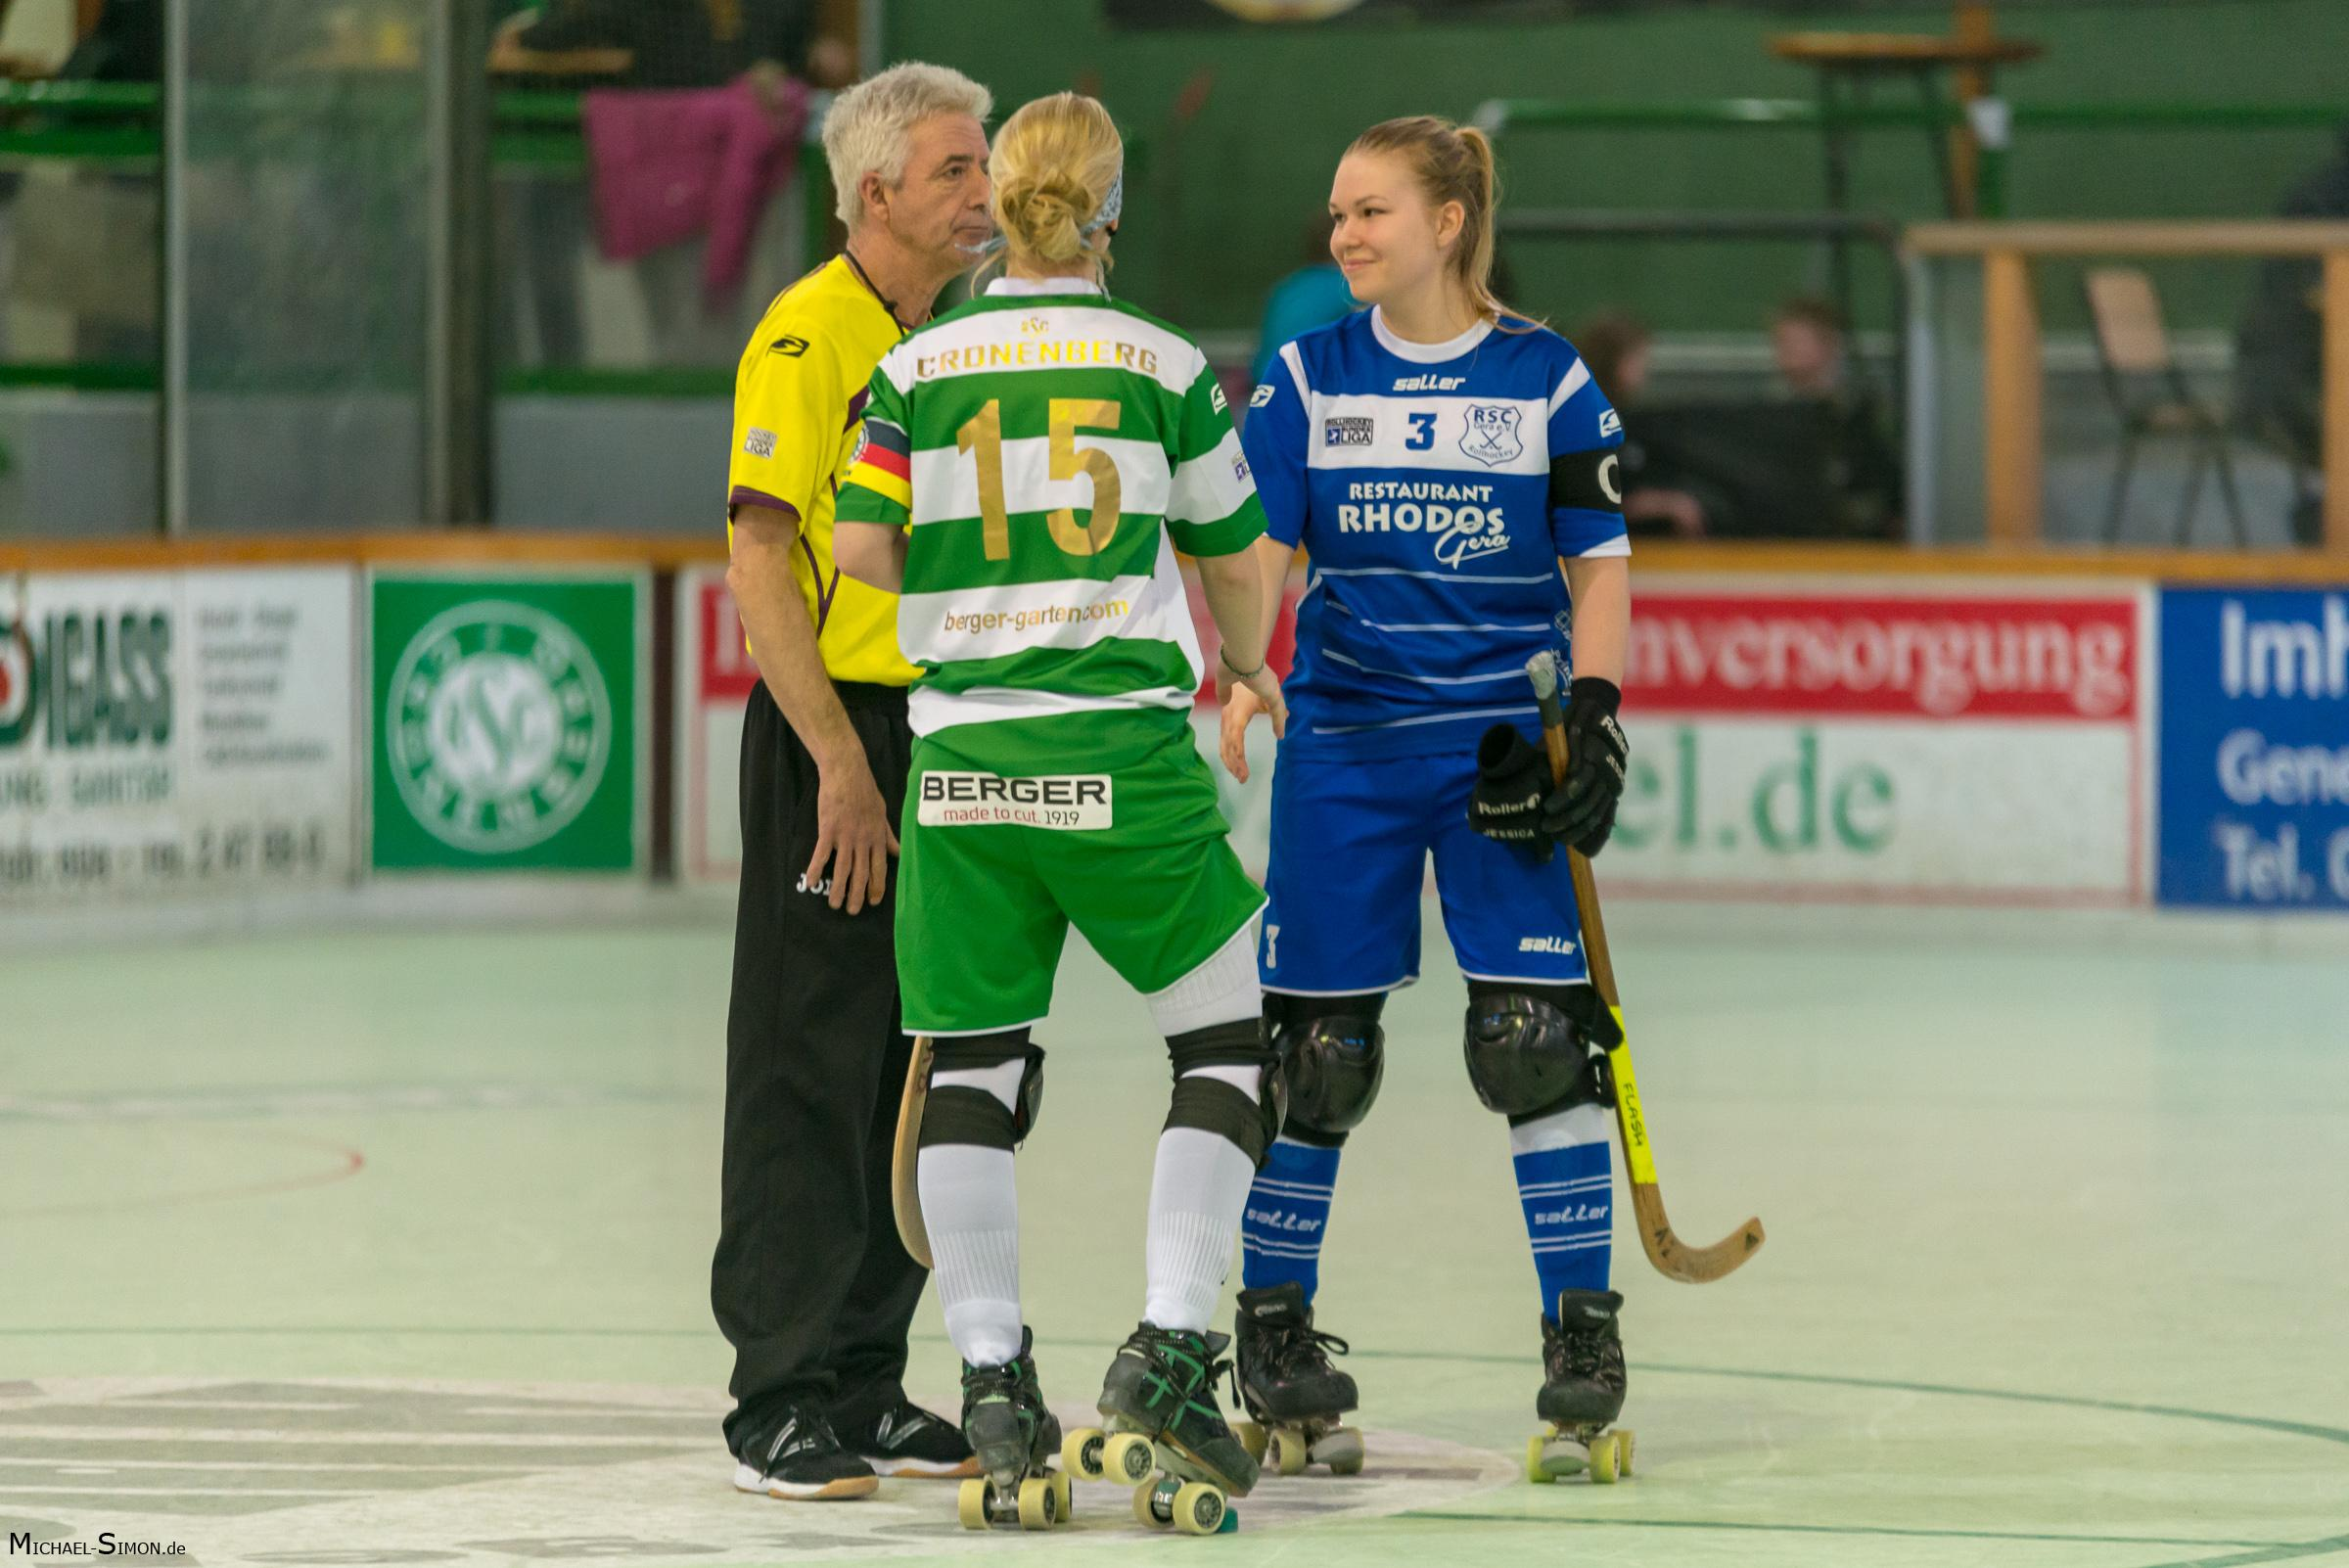 RSC Cronenberg Rollhockey Bundesliga Damen Spieltag 17.03.2018